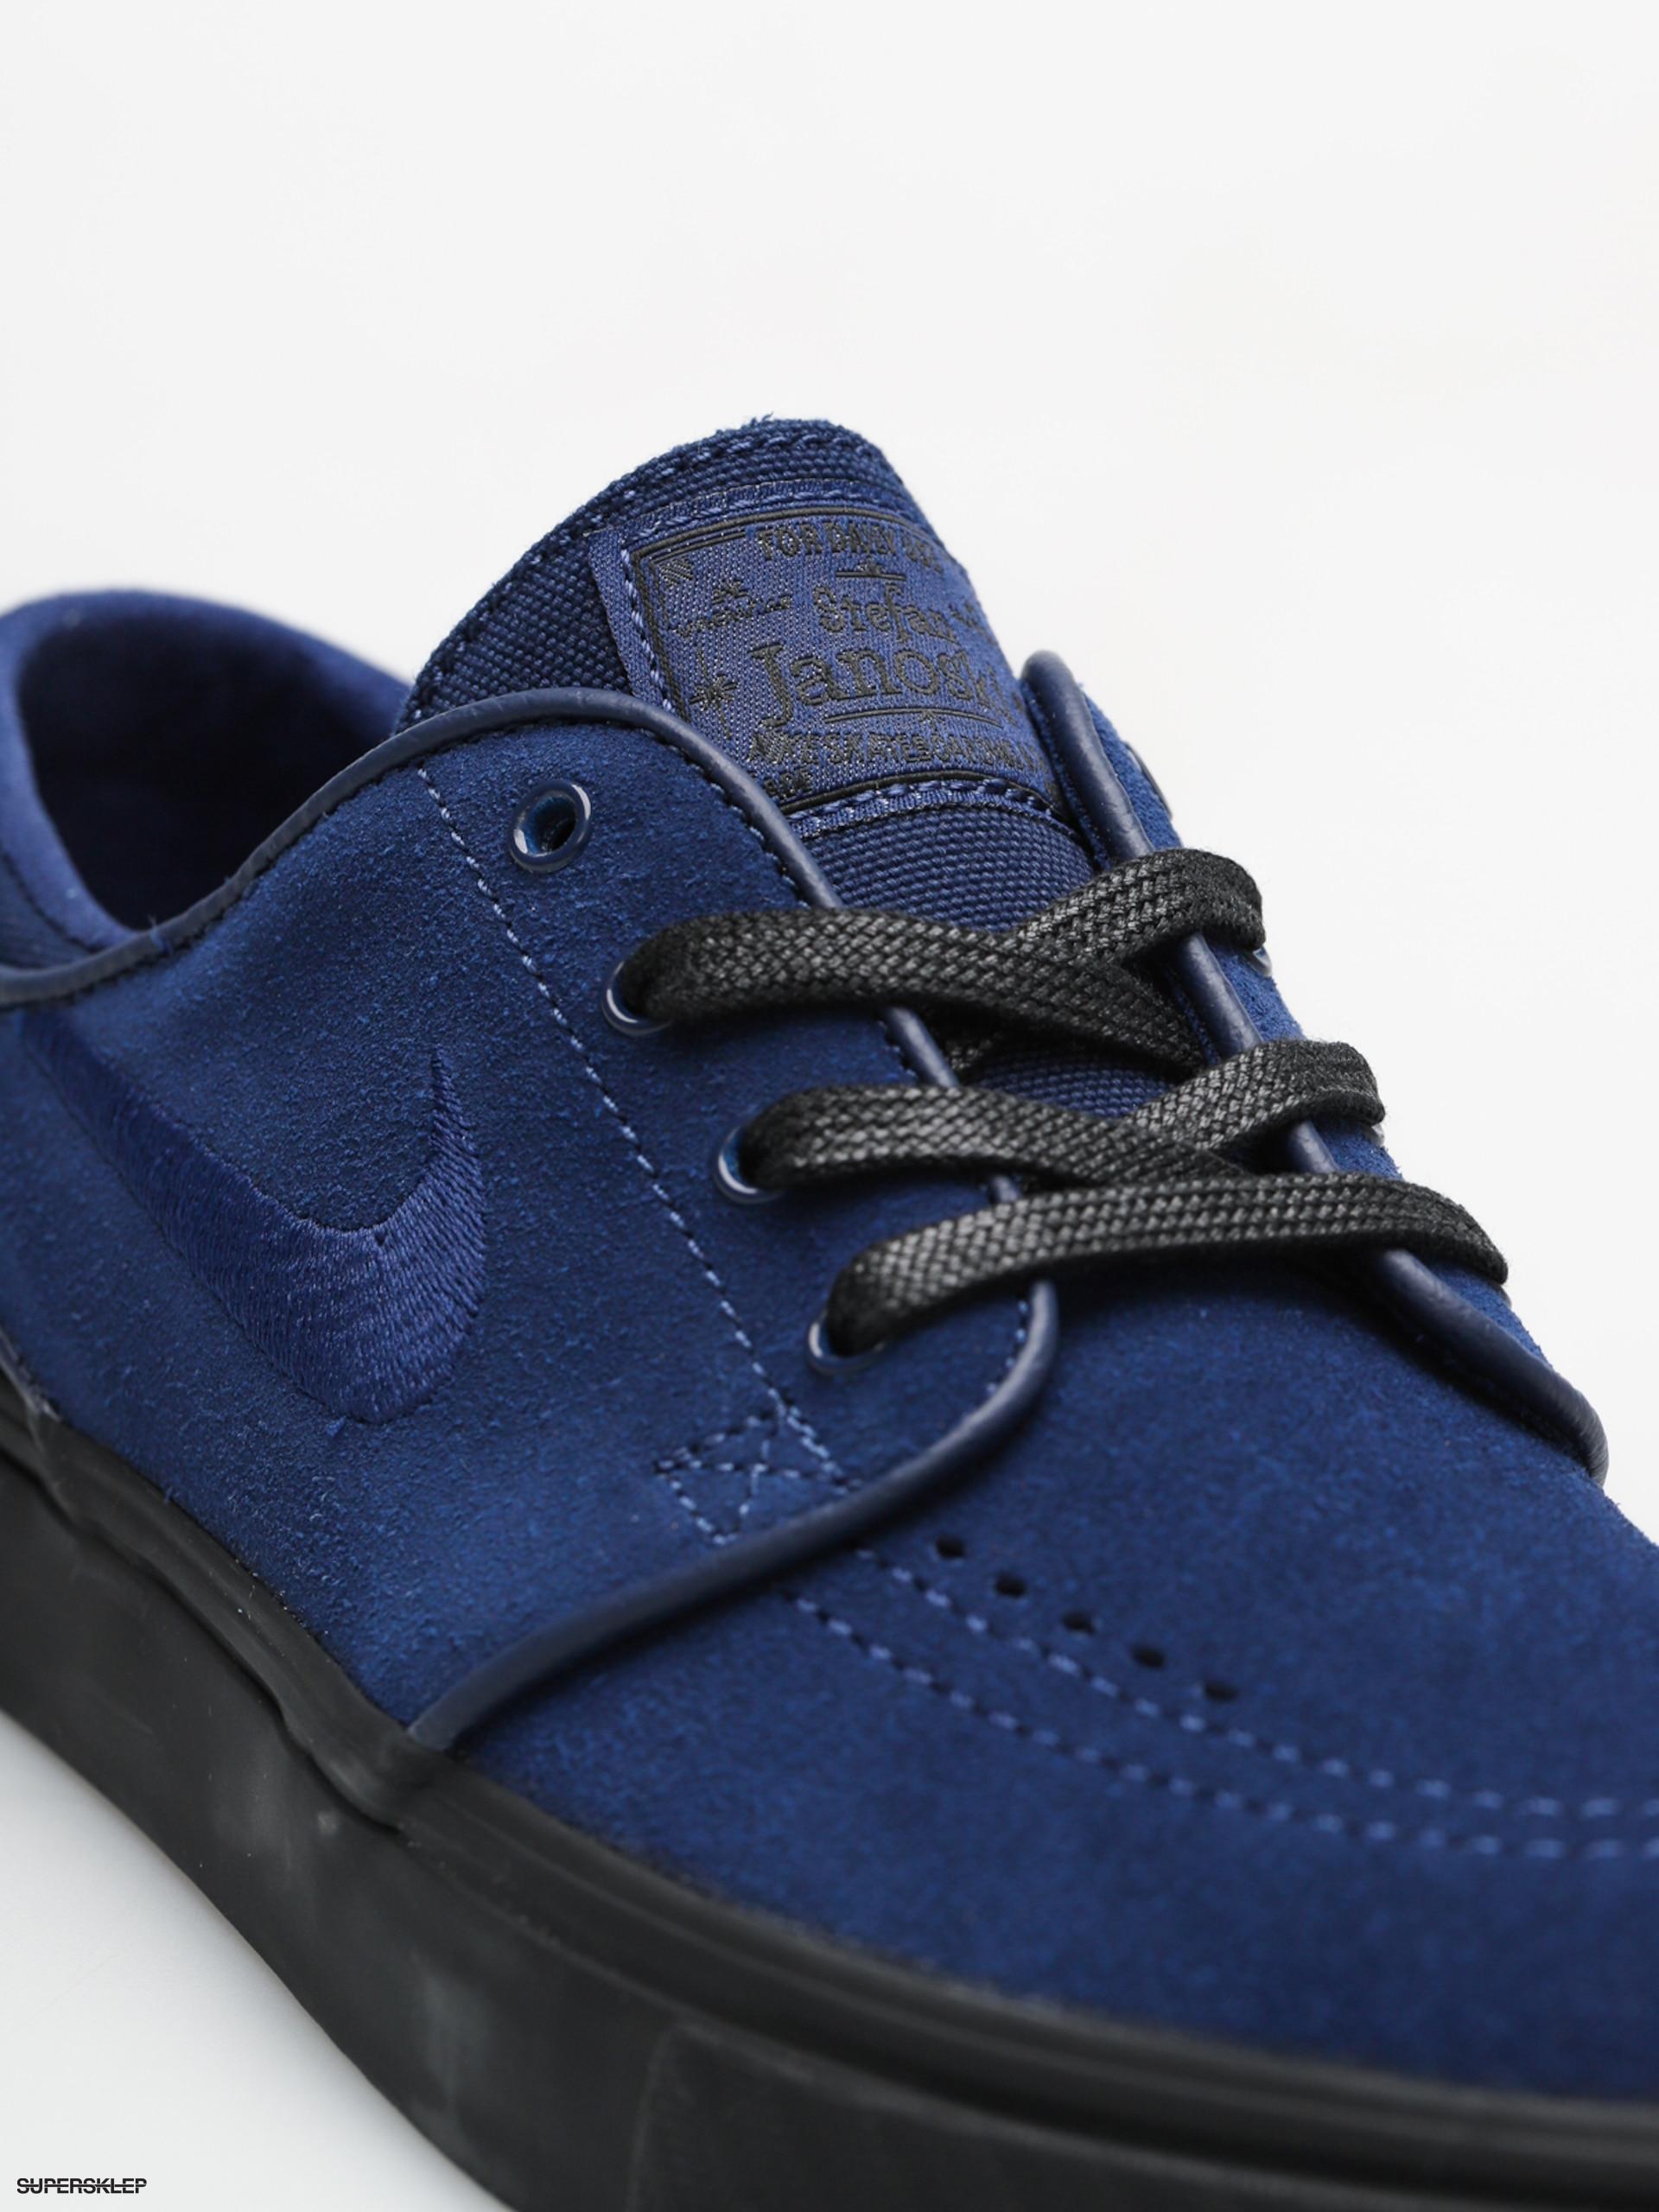 3eaf222fecb0f Voidblue Void Zoom Stefan Sb Buty blue Janoski Black Nike zCqYS